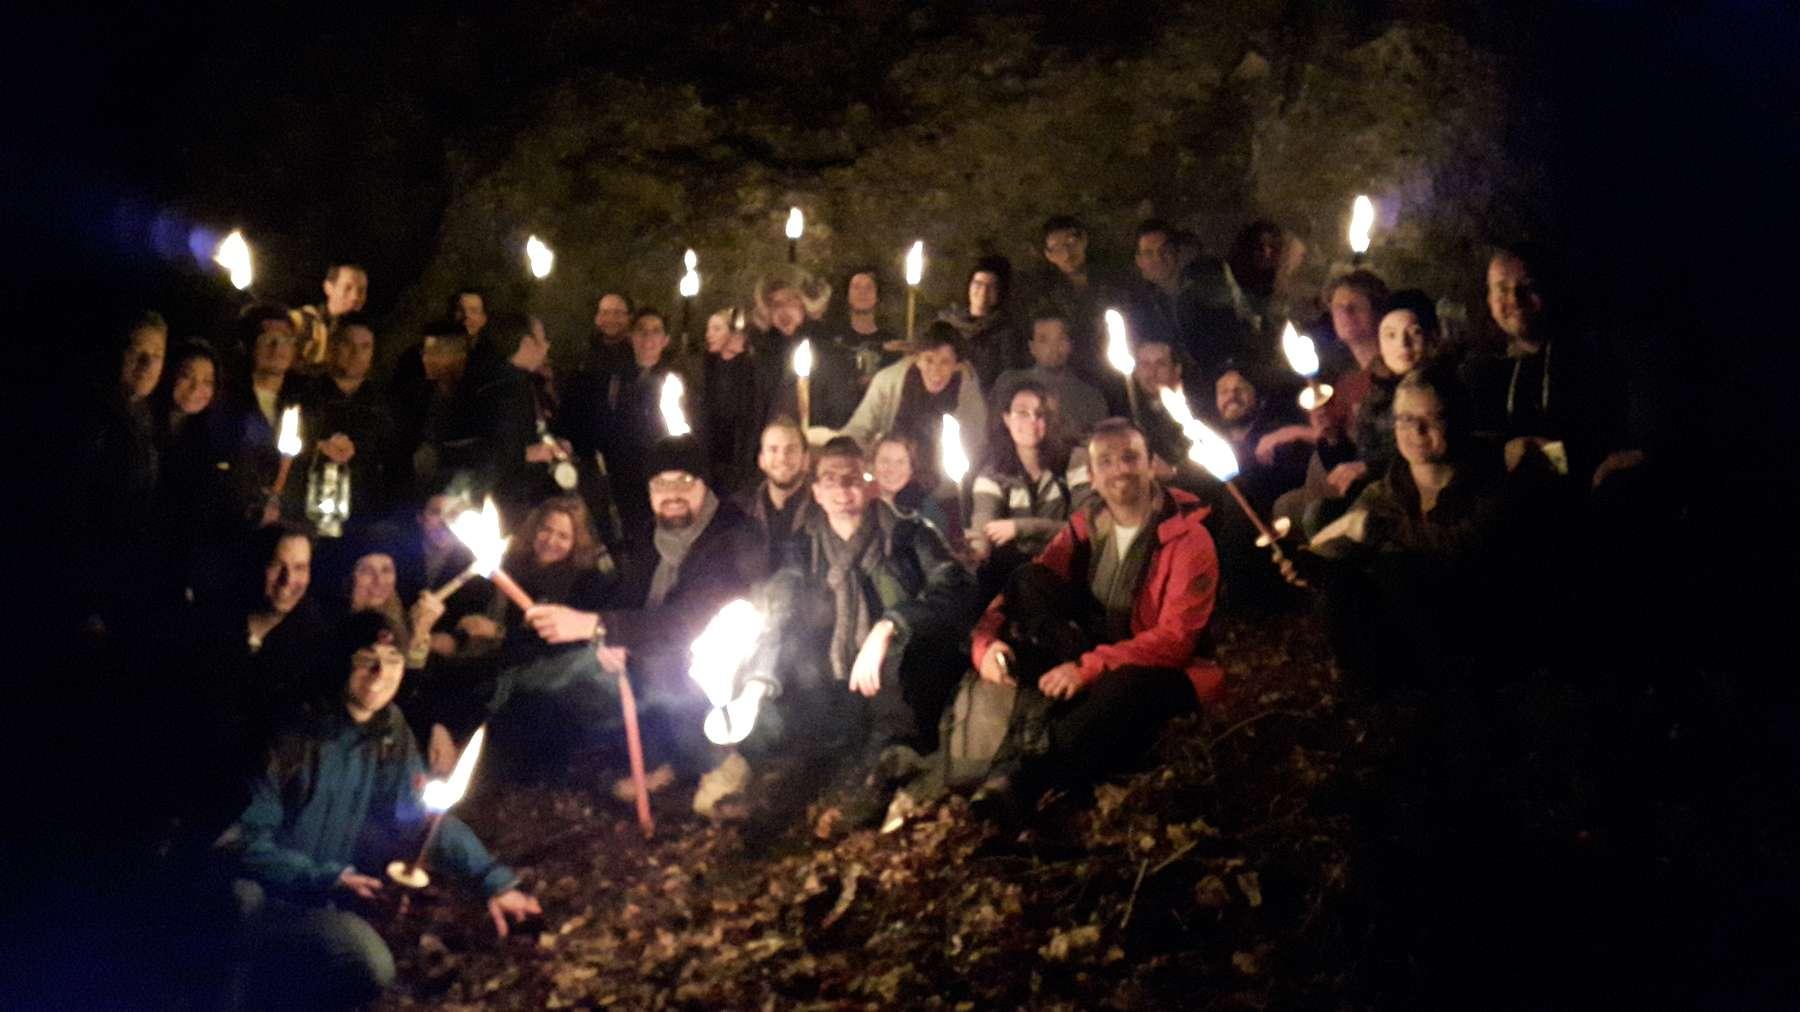 Foto Fackelwanderung Ütliberg 2015 Organisator Janos Horvath